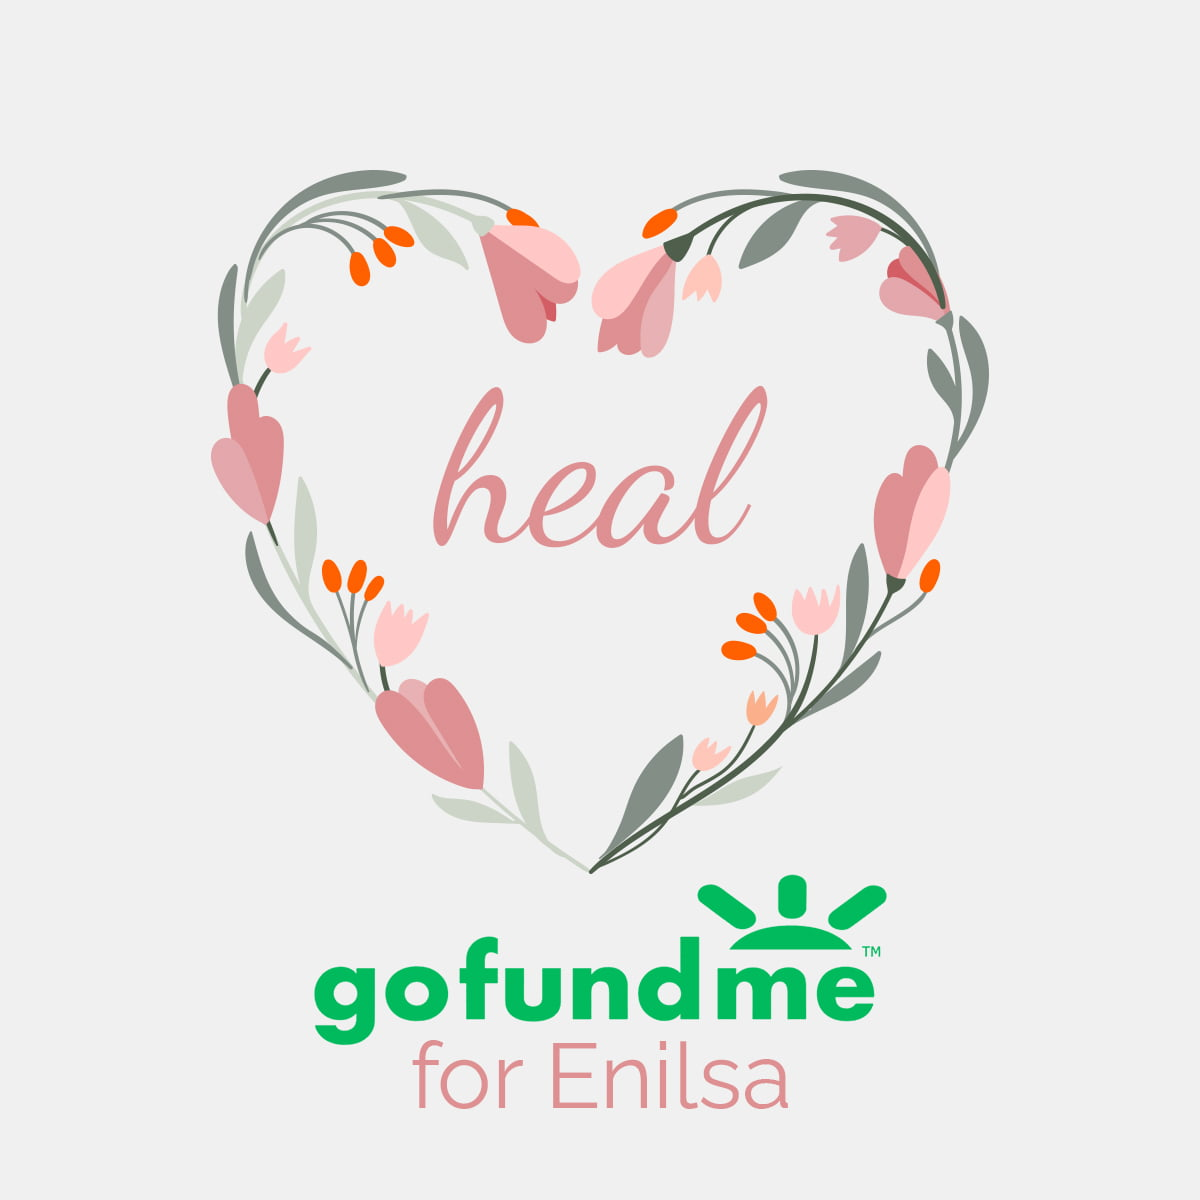 GoFundMe for Enilsa